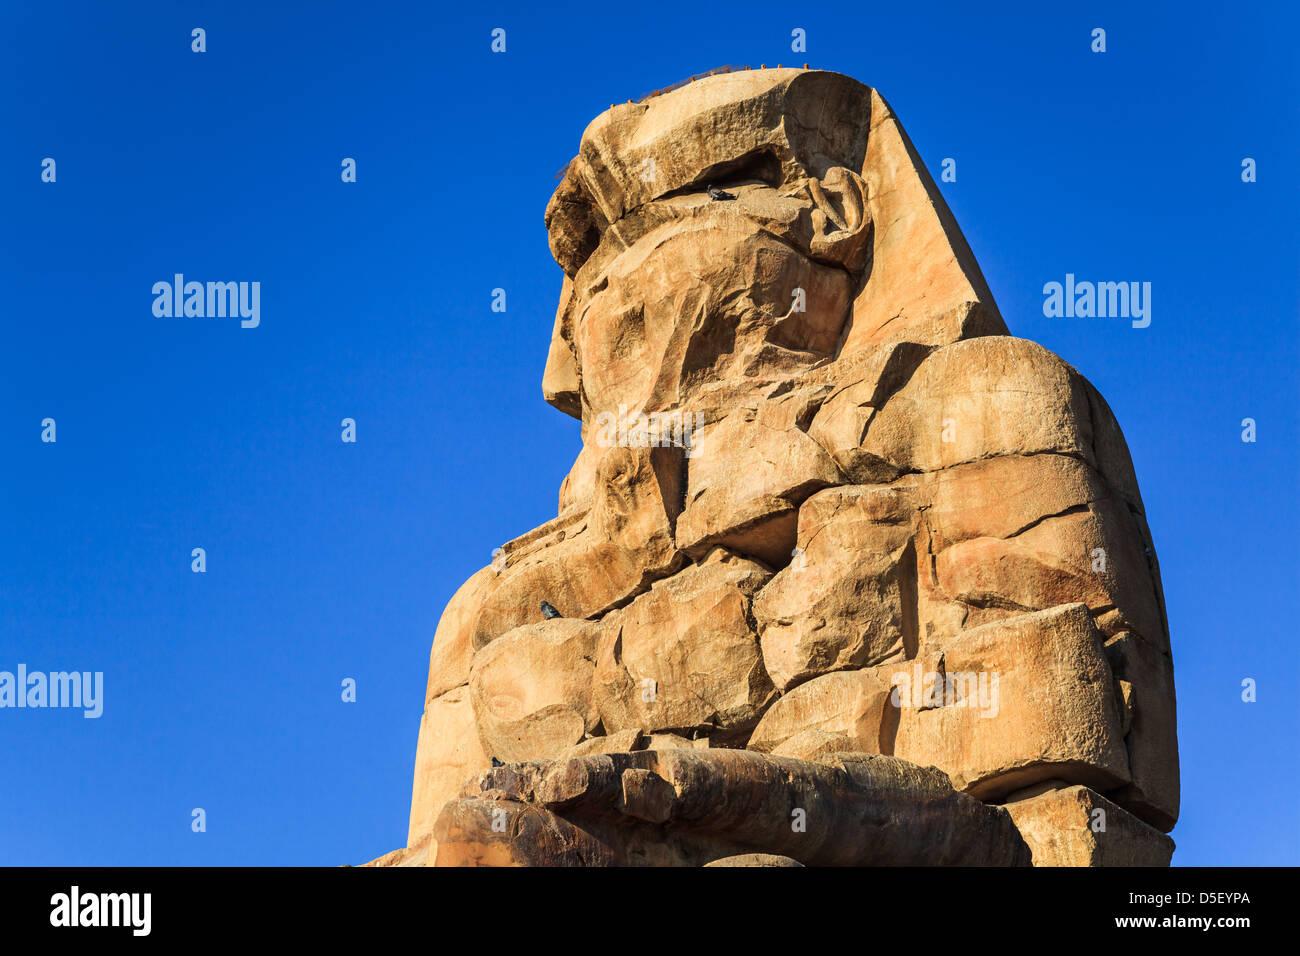 ancient-sculpture-of-colossus-memnon-lux